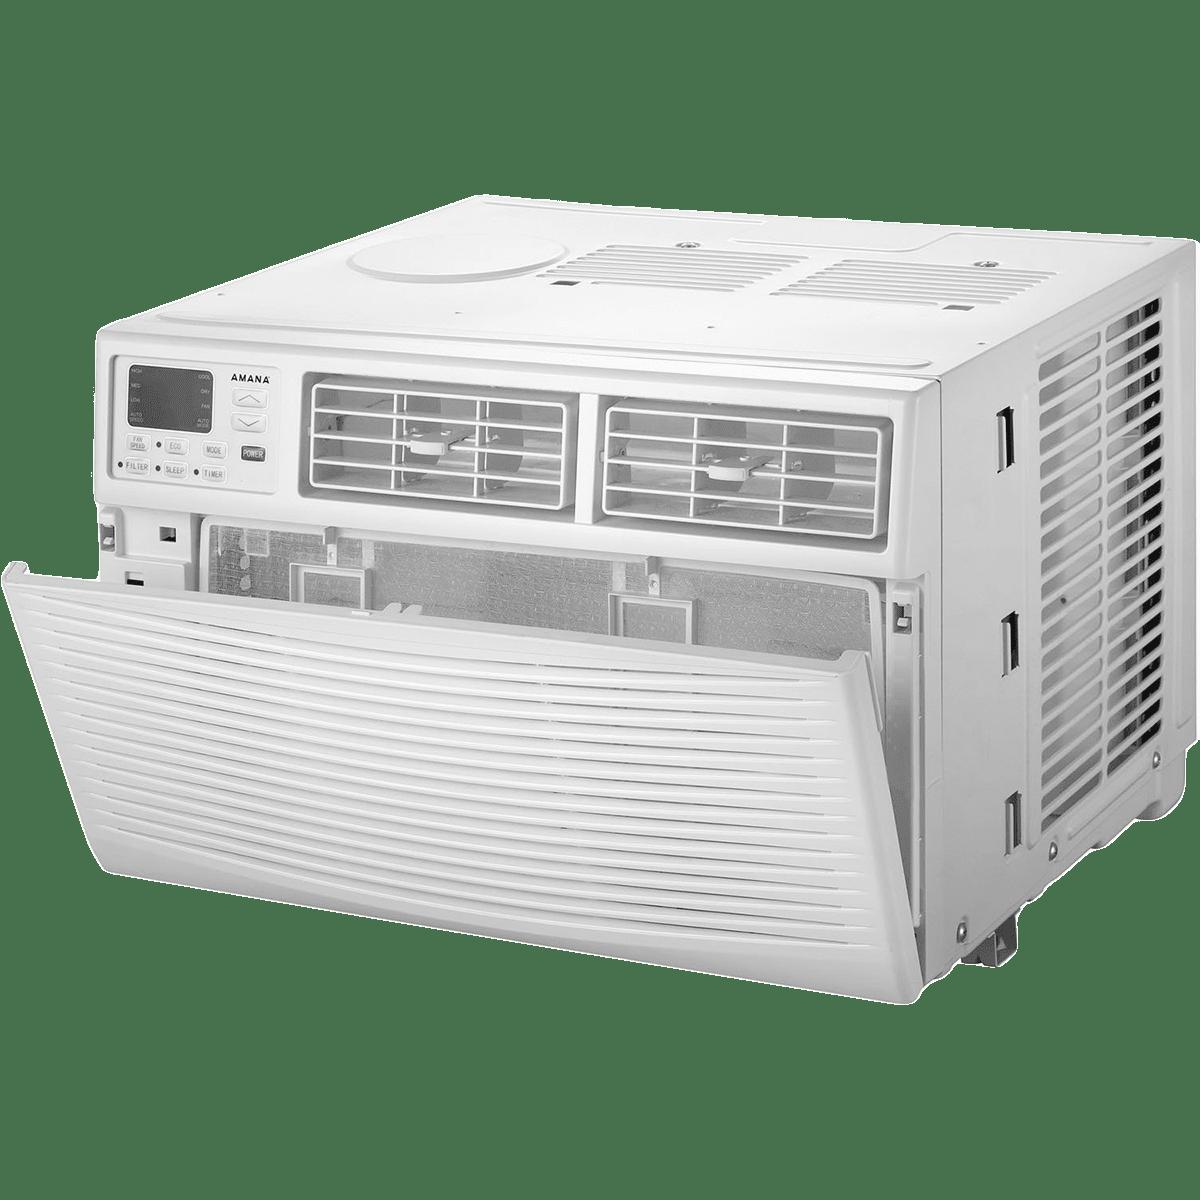 Amana 12000 BTU Window Air Conditioner with Electronic Controls | Sylvane